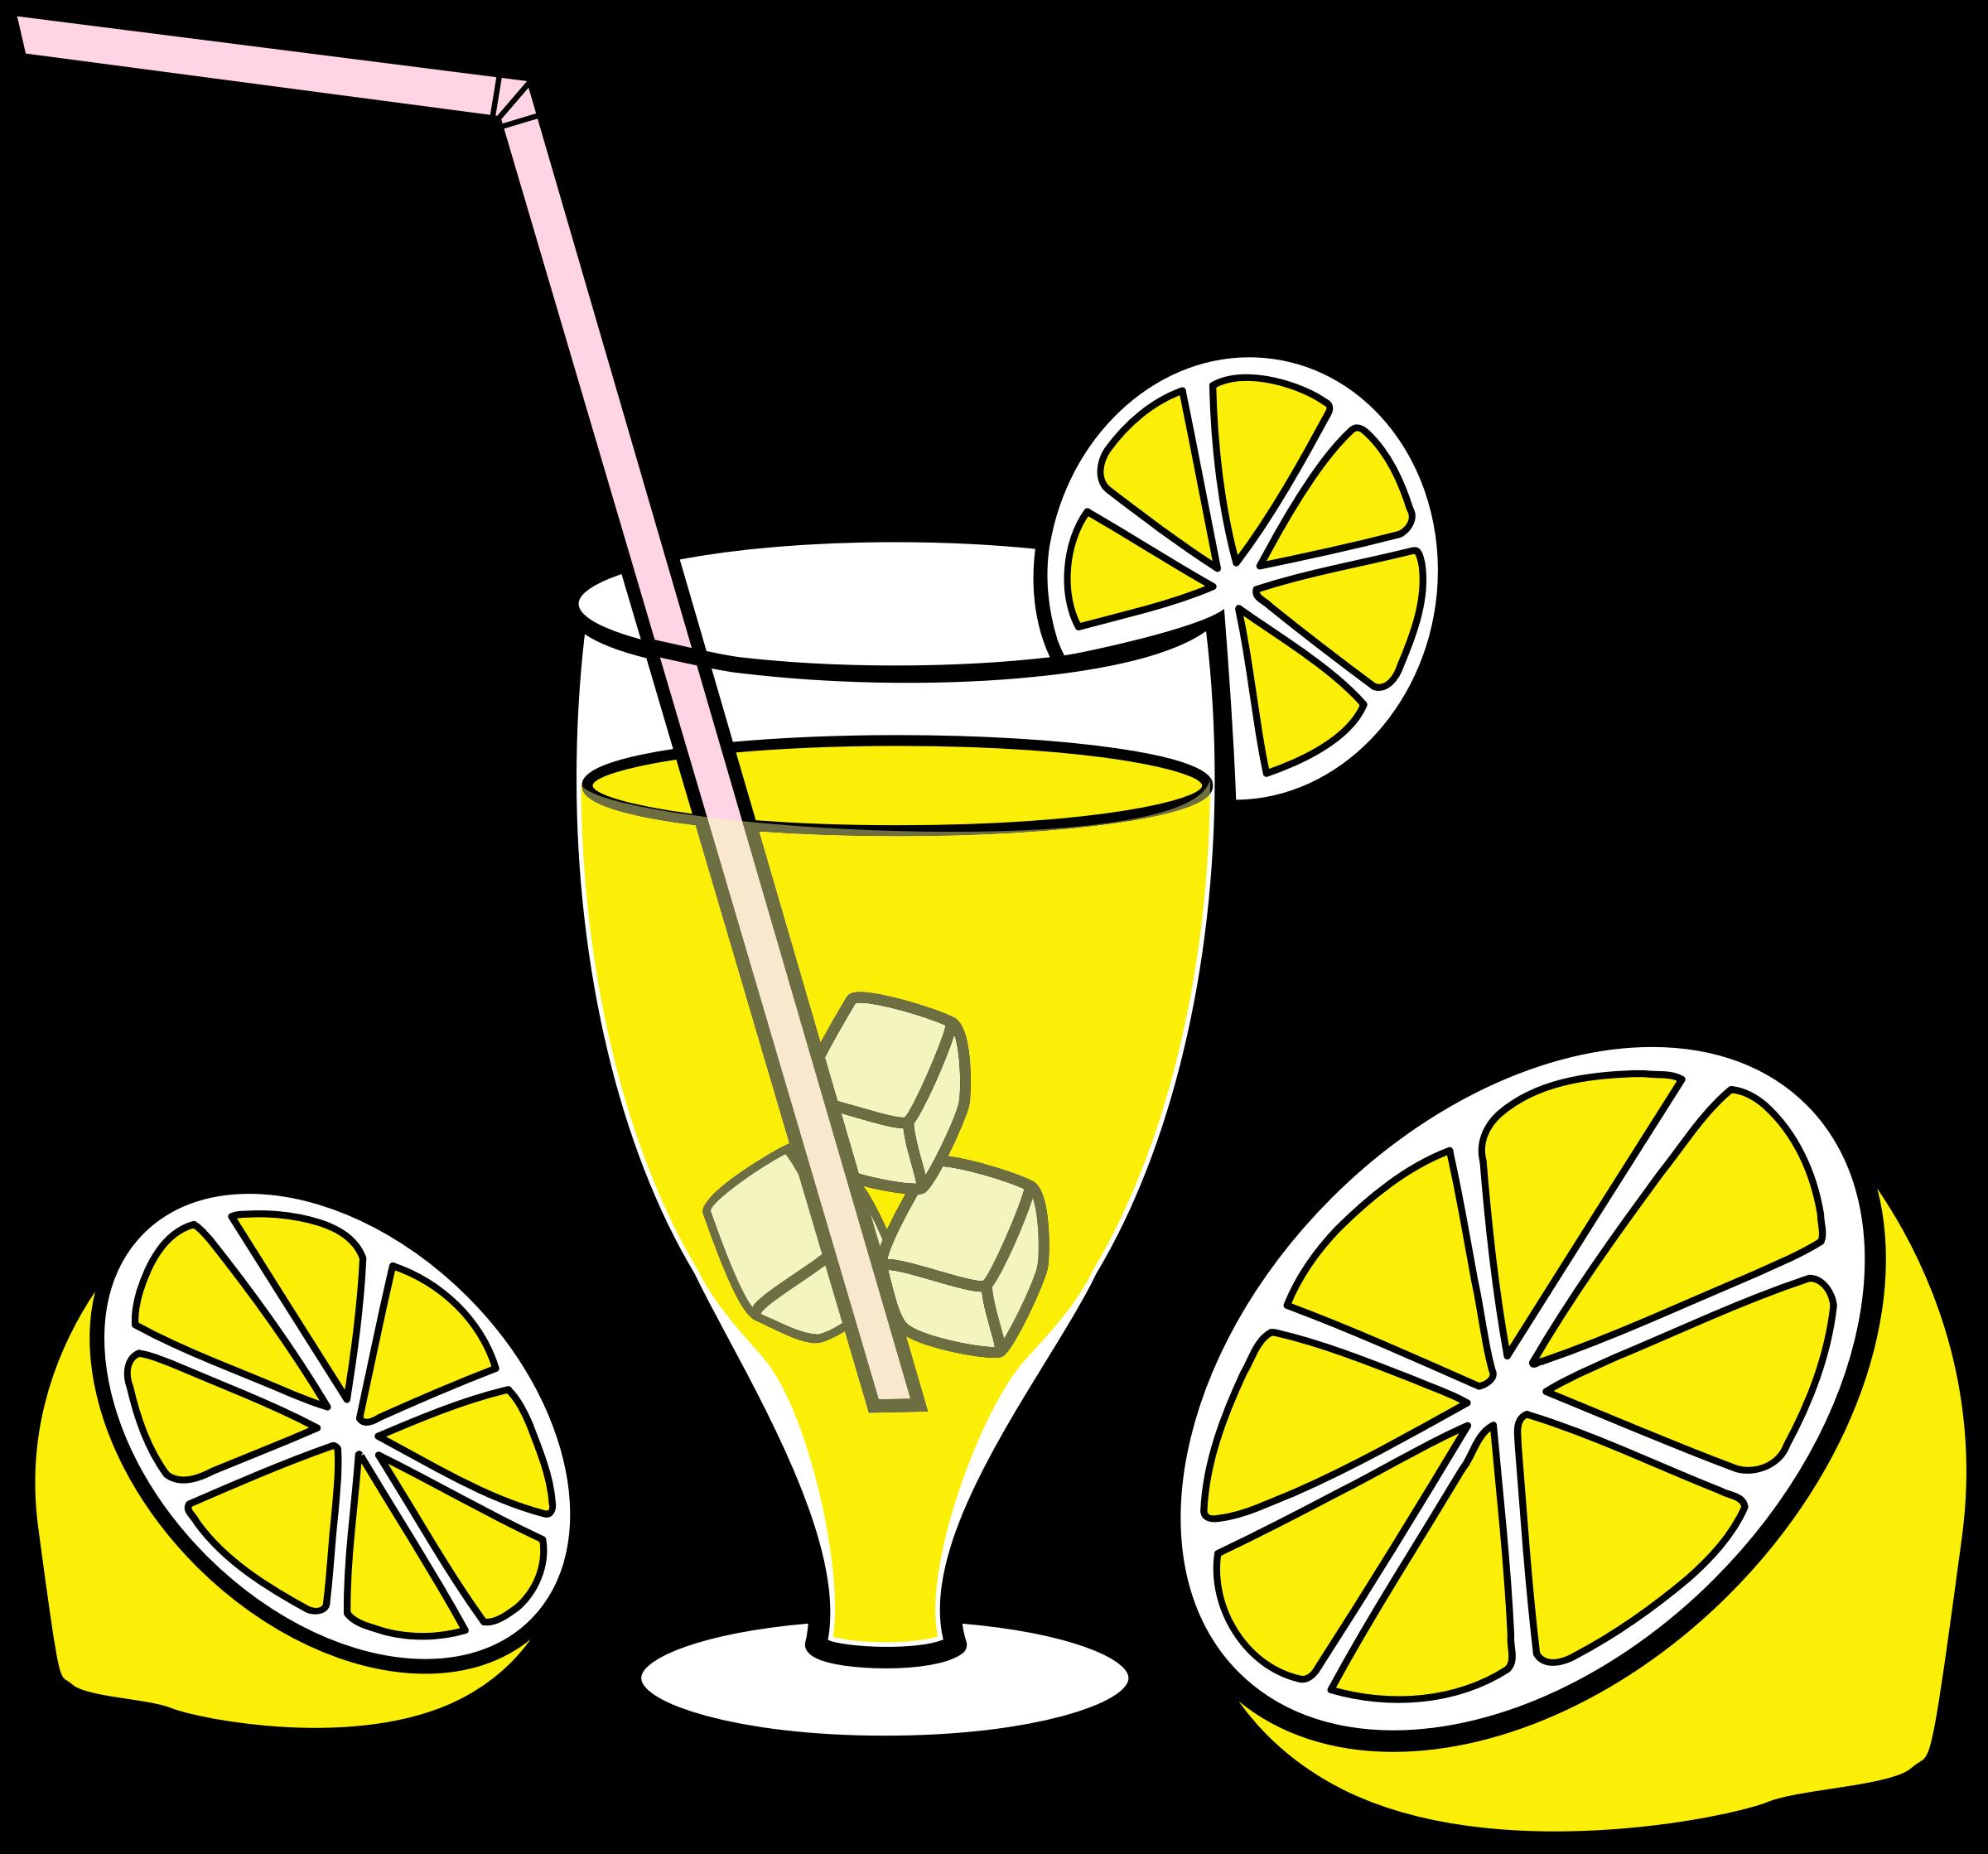 Big image png. Glasses clipart lemonade